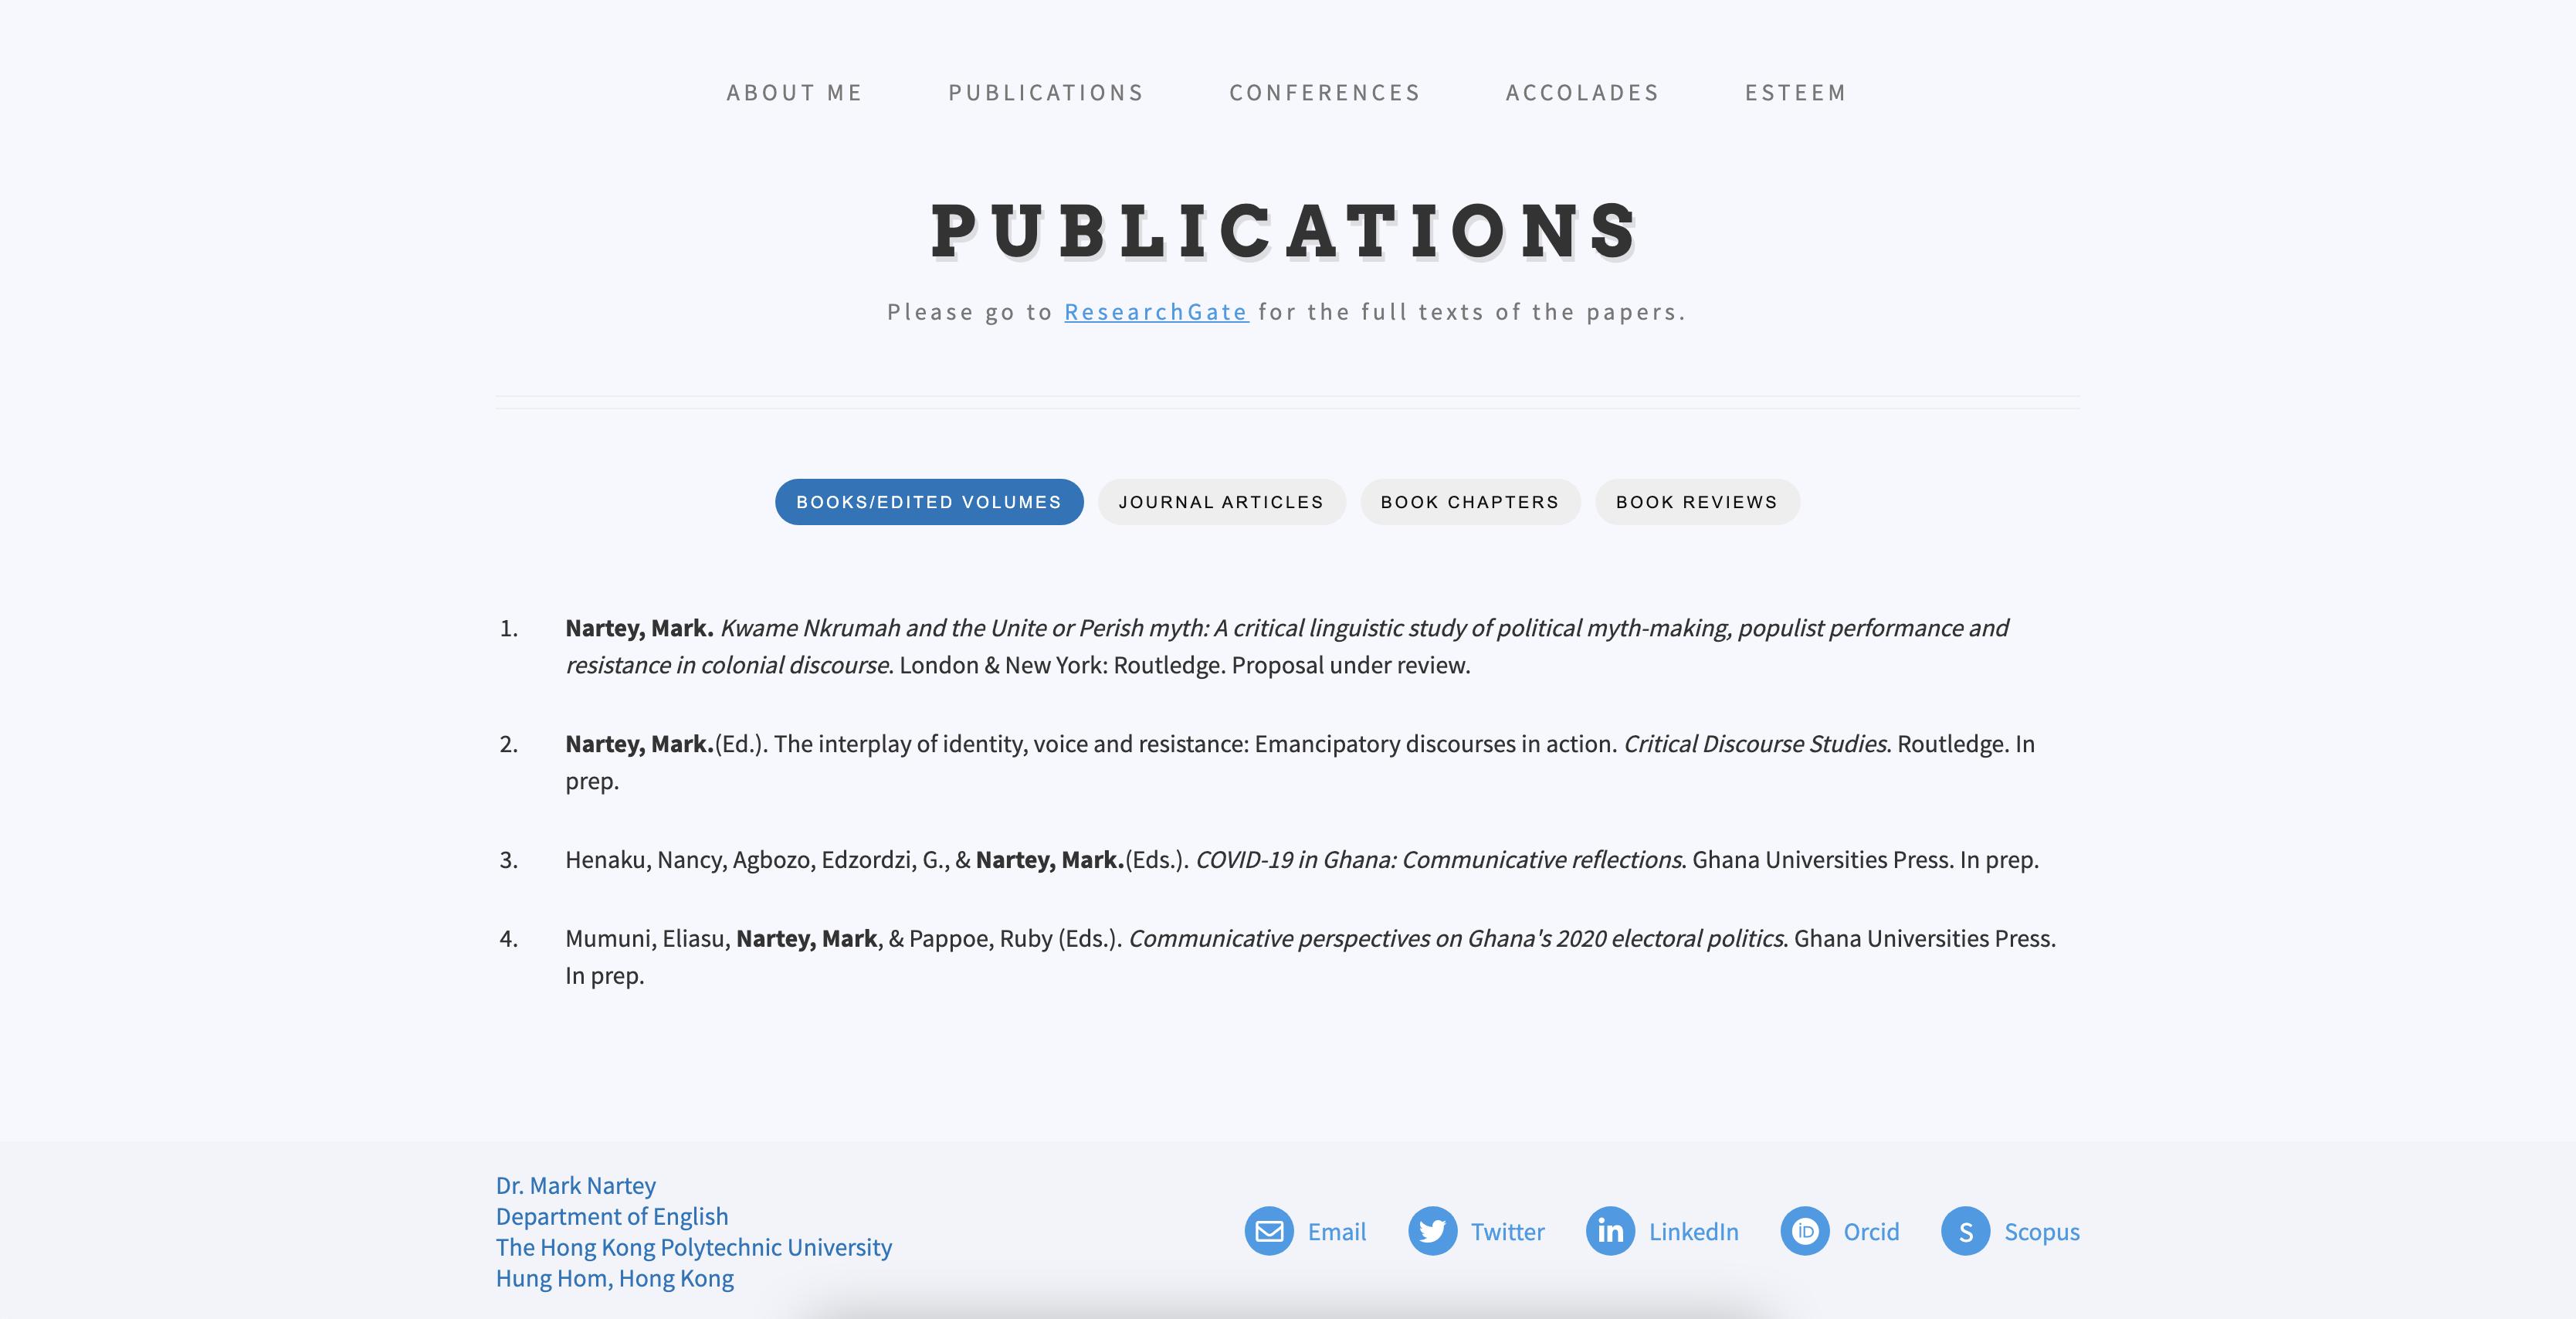 An academic portfolio for Mark Nartey